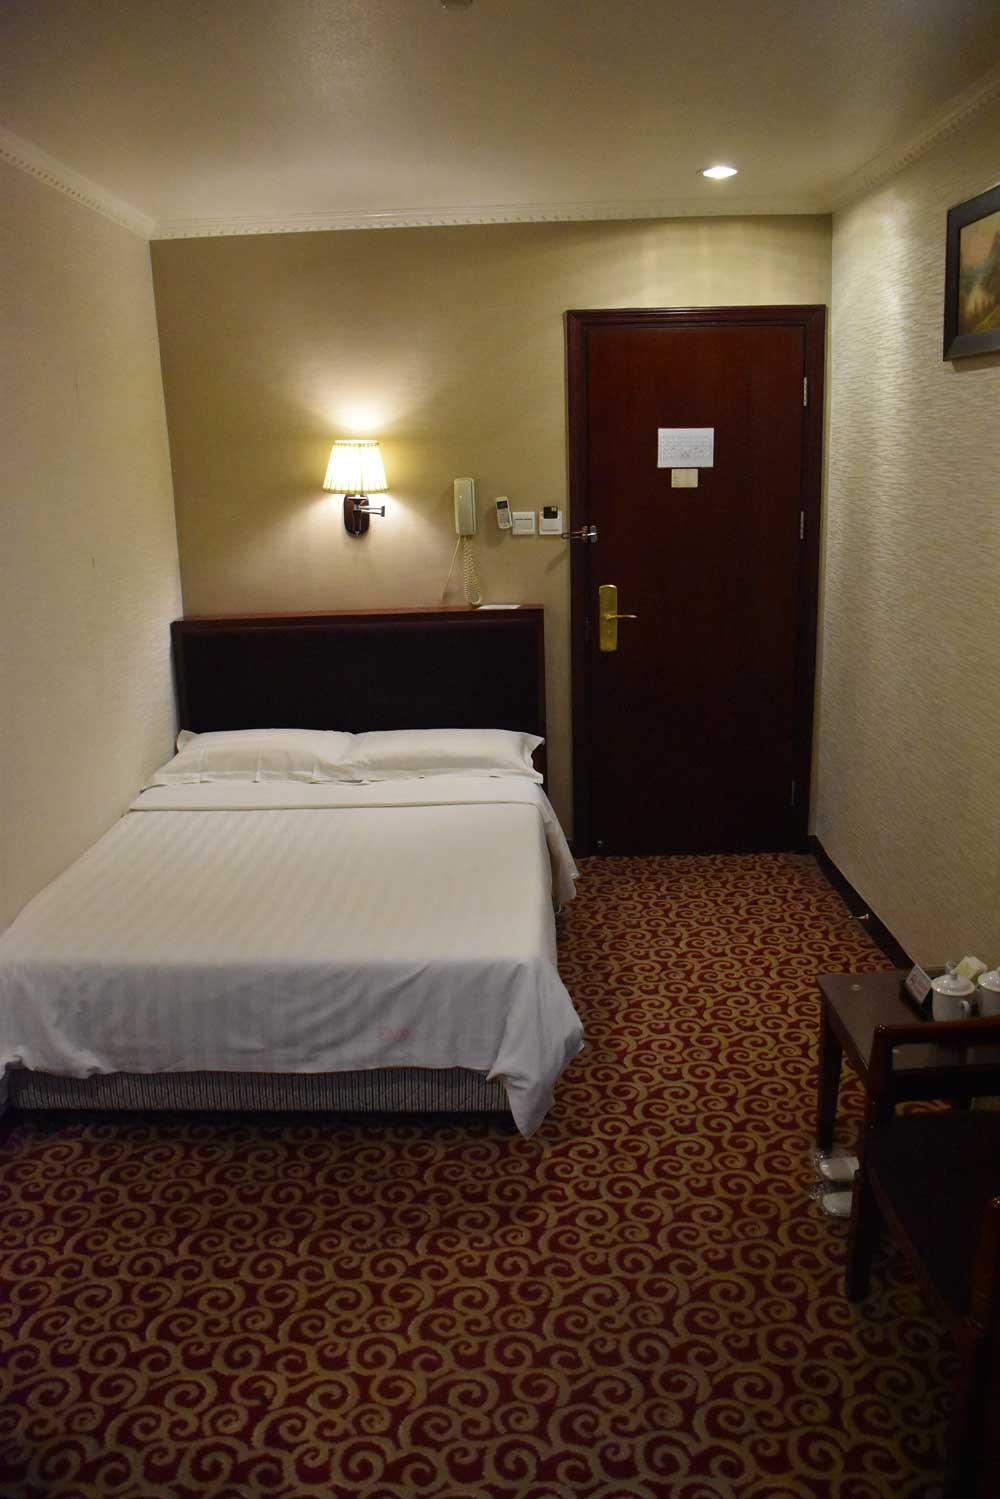 East Asia Hotel room